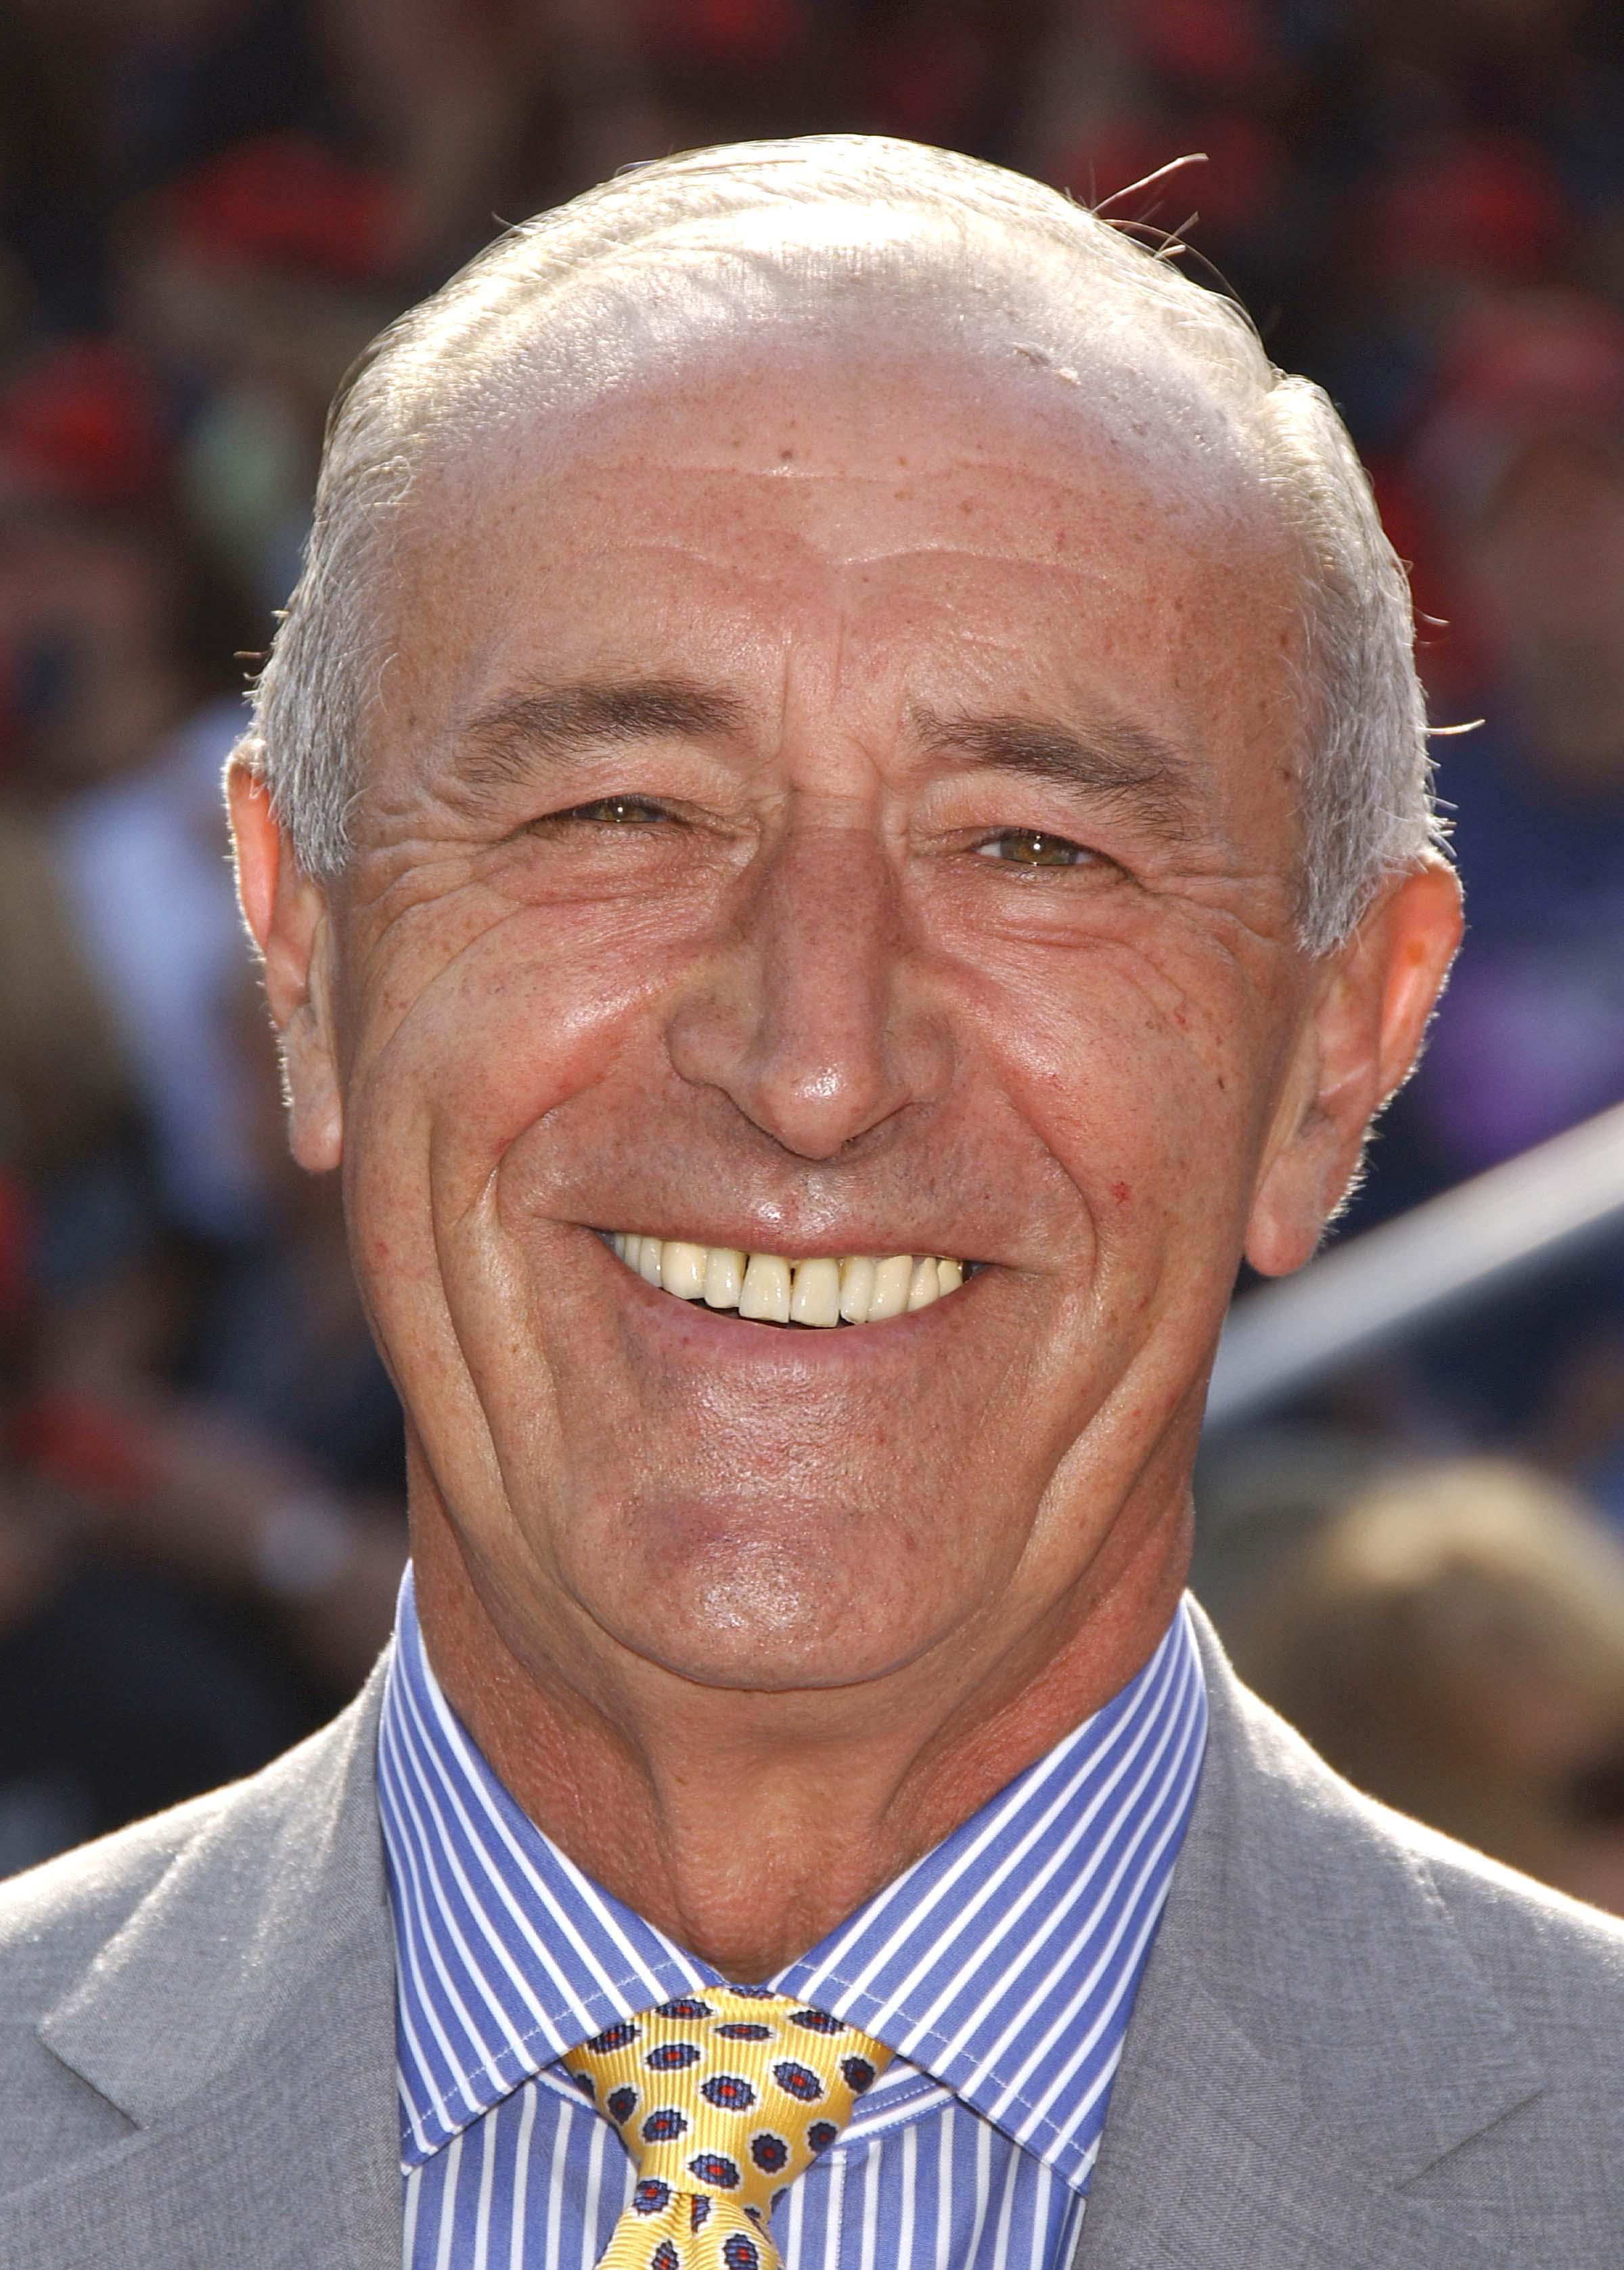 Strictly's Len Goodman lands film role!